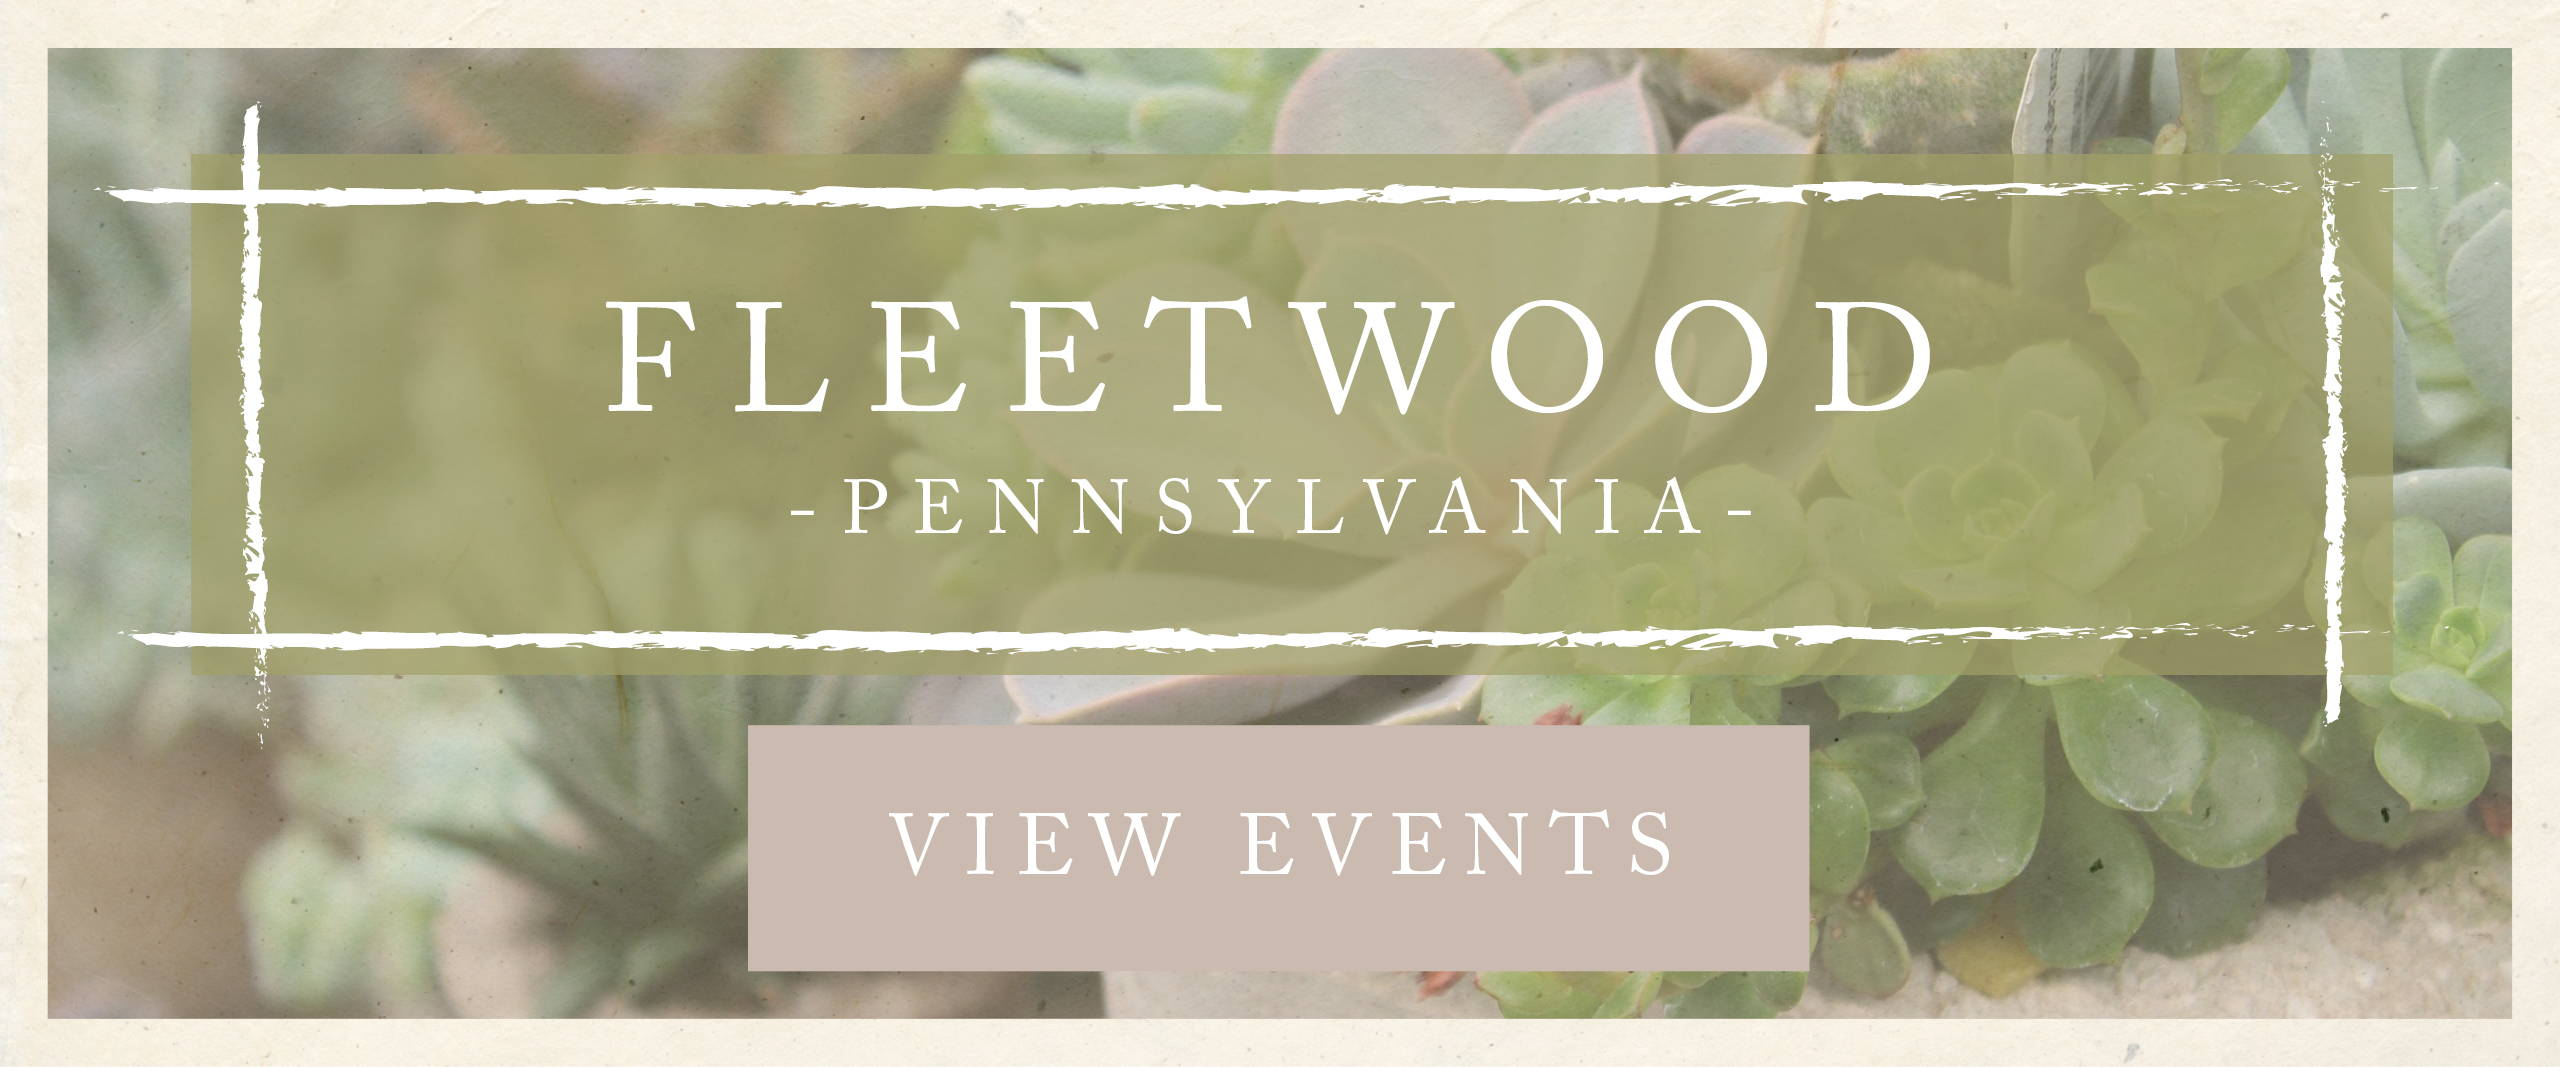 View Fleetwood Events